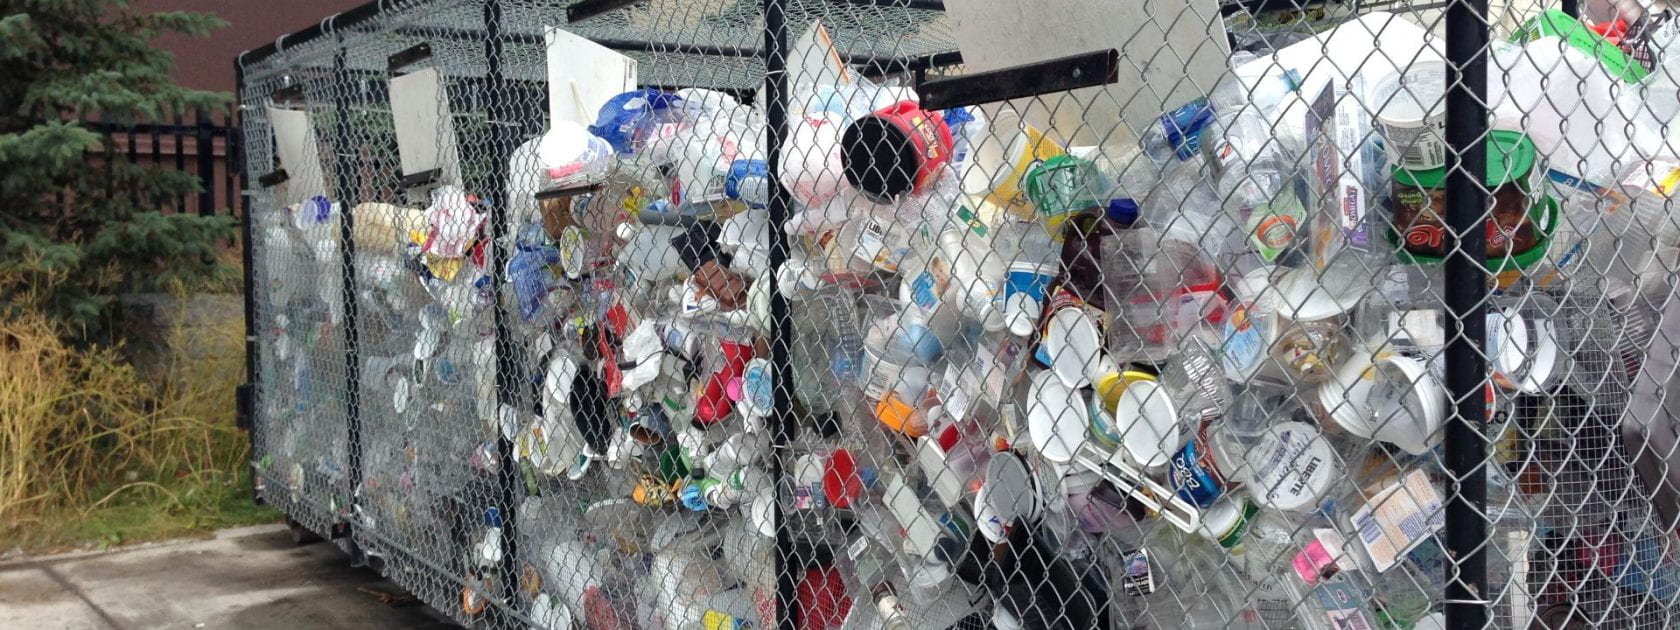 Wired trash bins